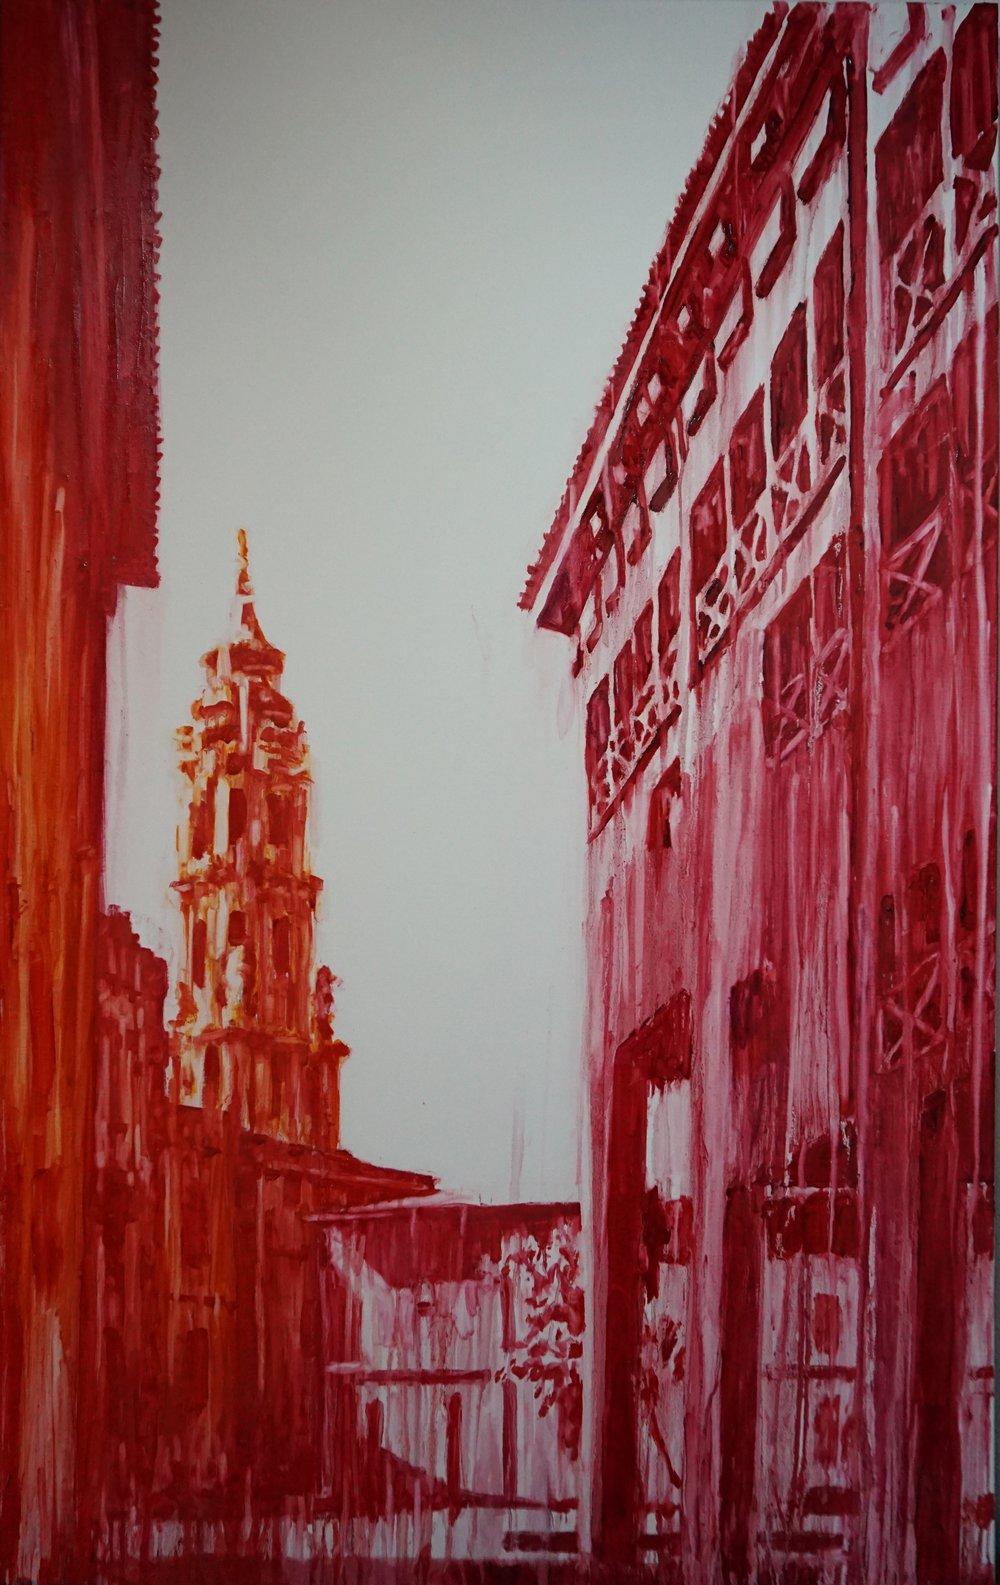 Red, Orange and Carmine